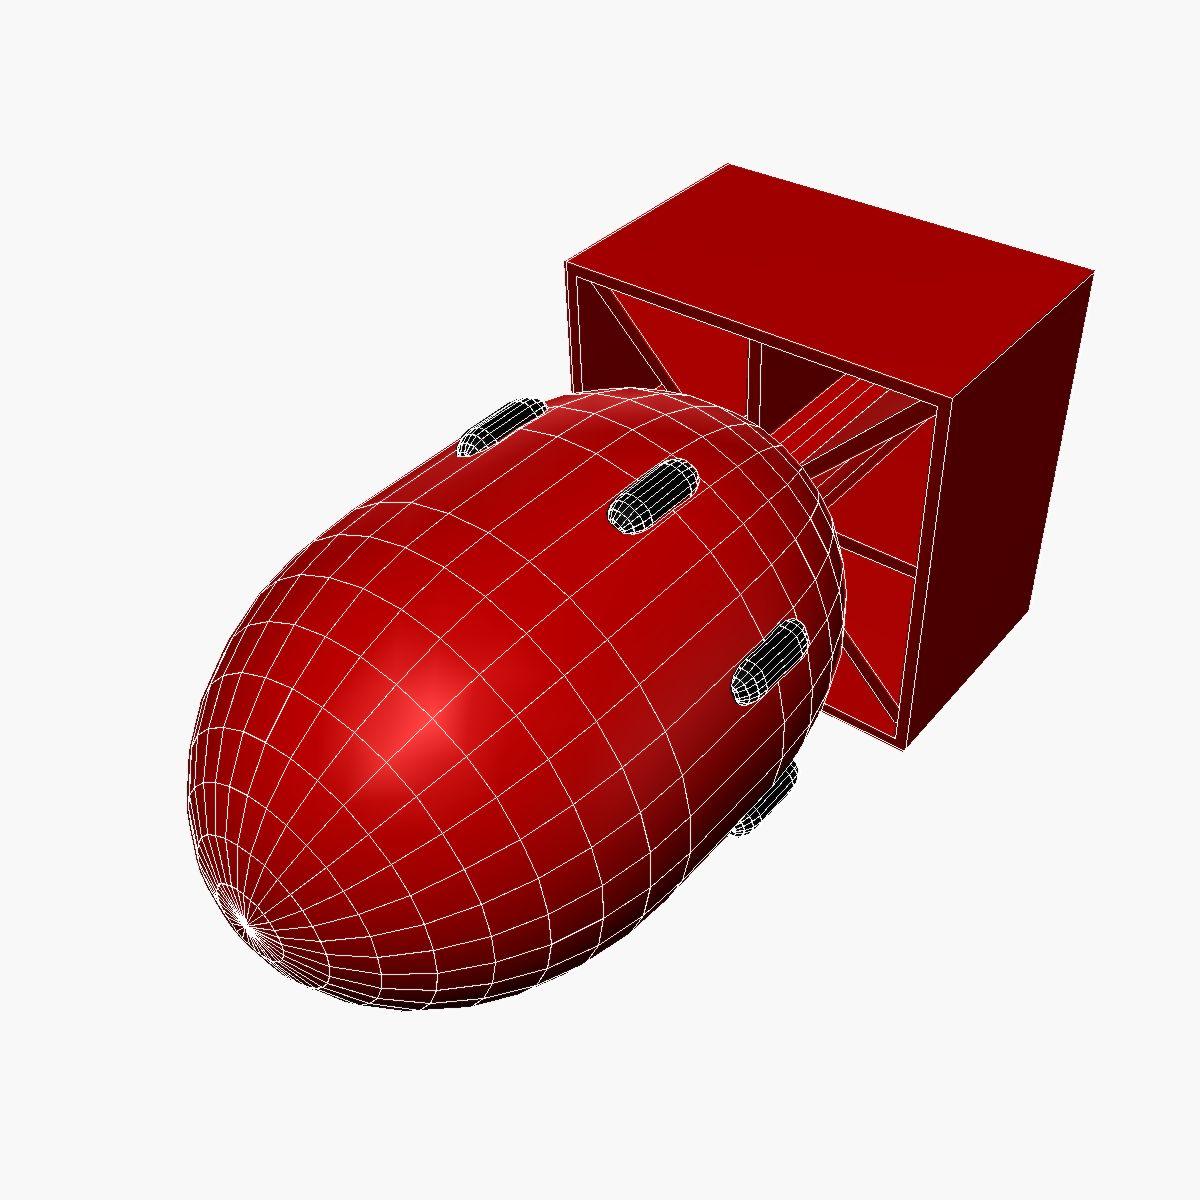 bomb with fatboy scheme 3d model 3ds dxf fbx blend cob dae x obj 162696